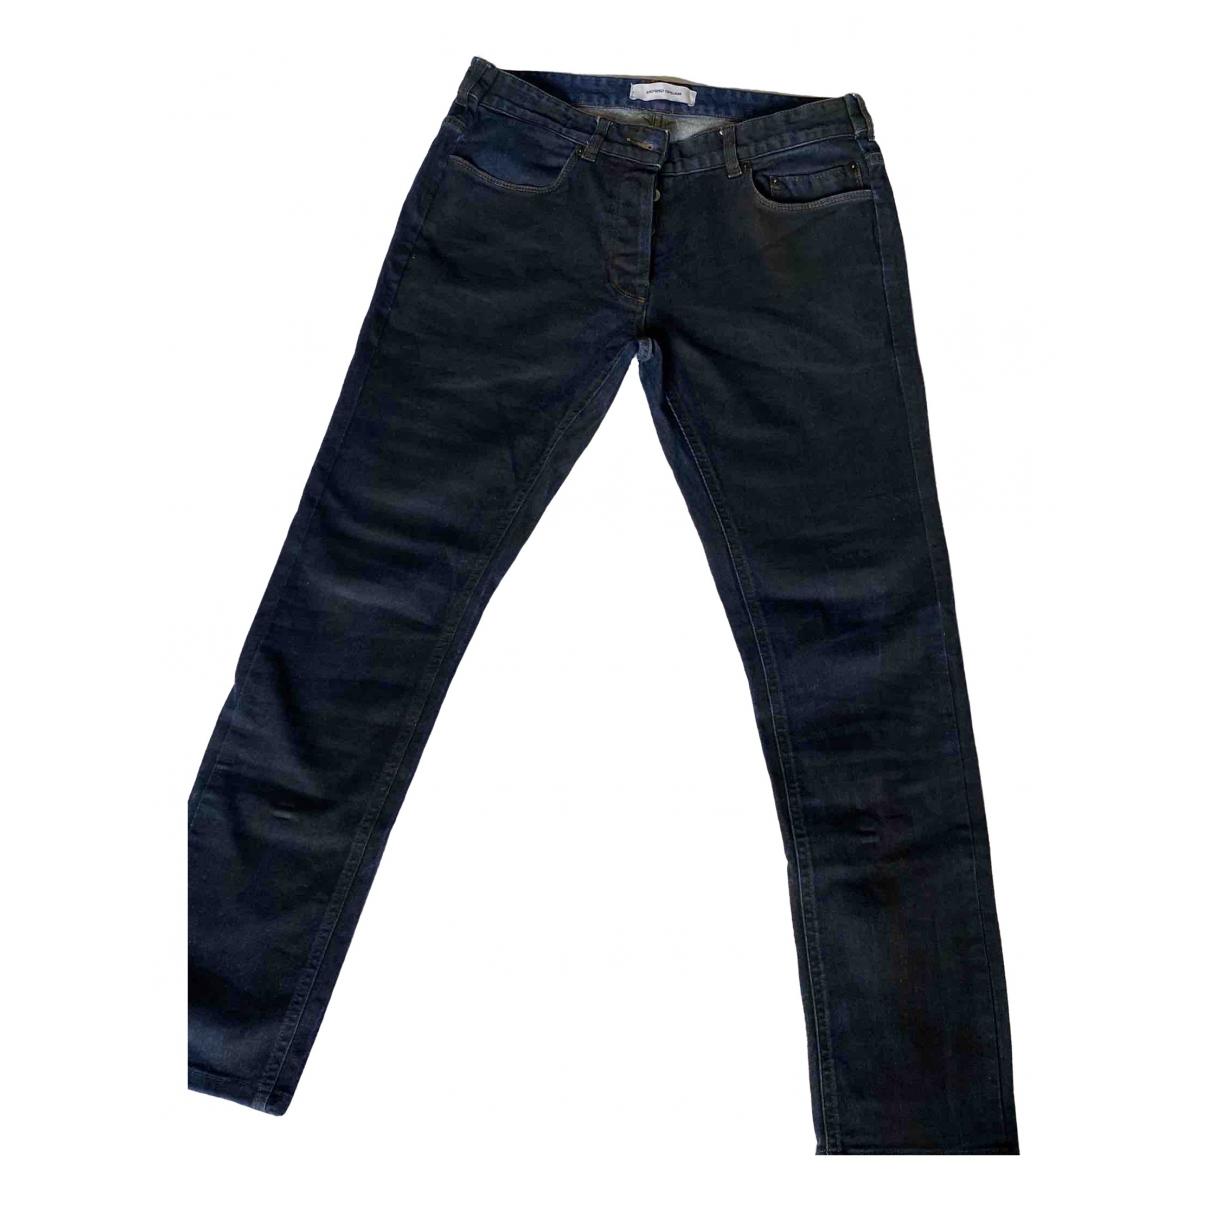 Mauro Grifoni \N Blue Cotton Jeans for Men 33 US